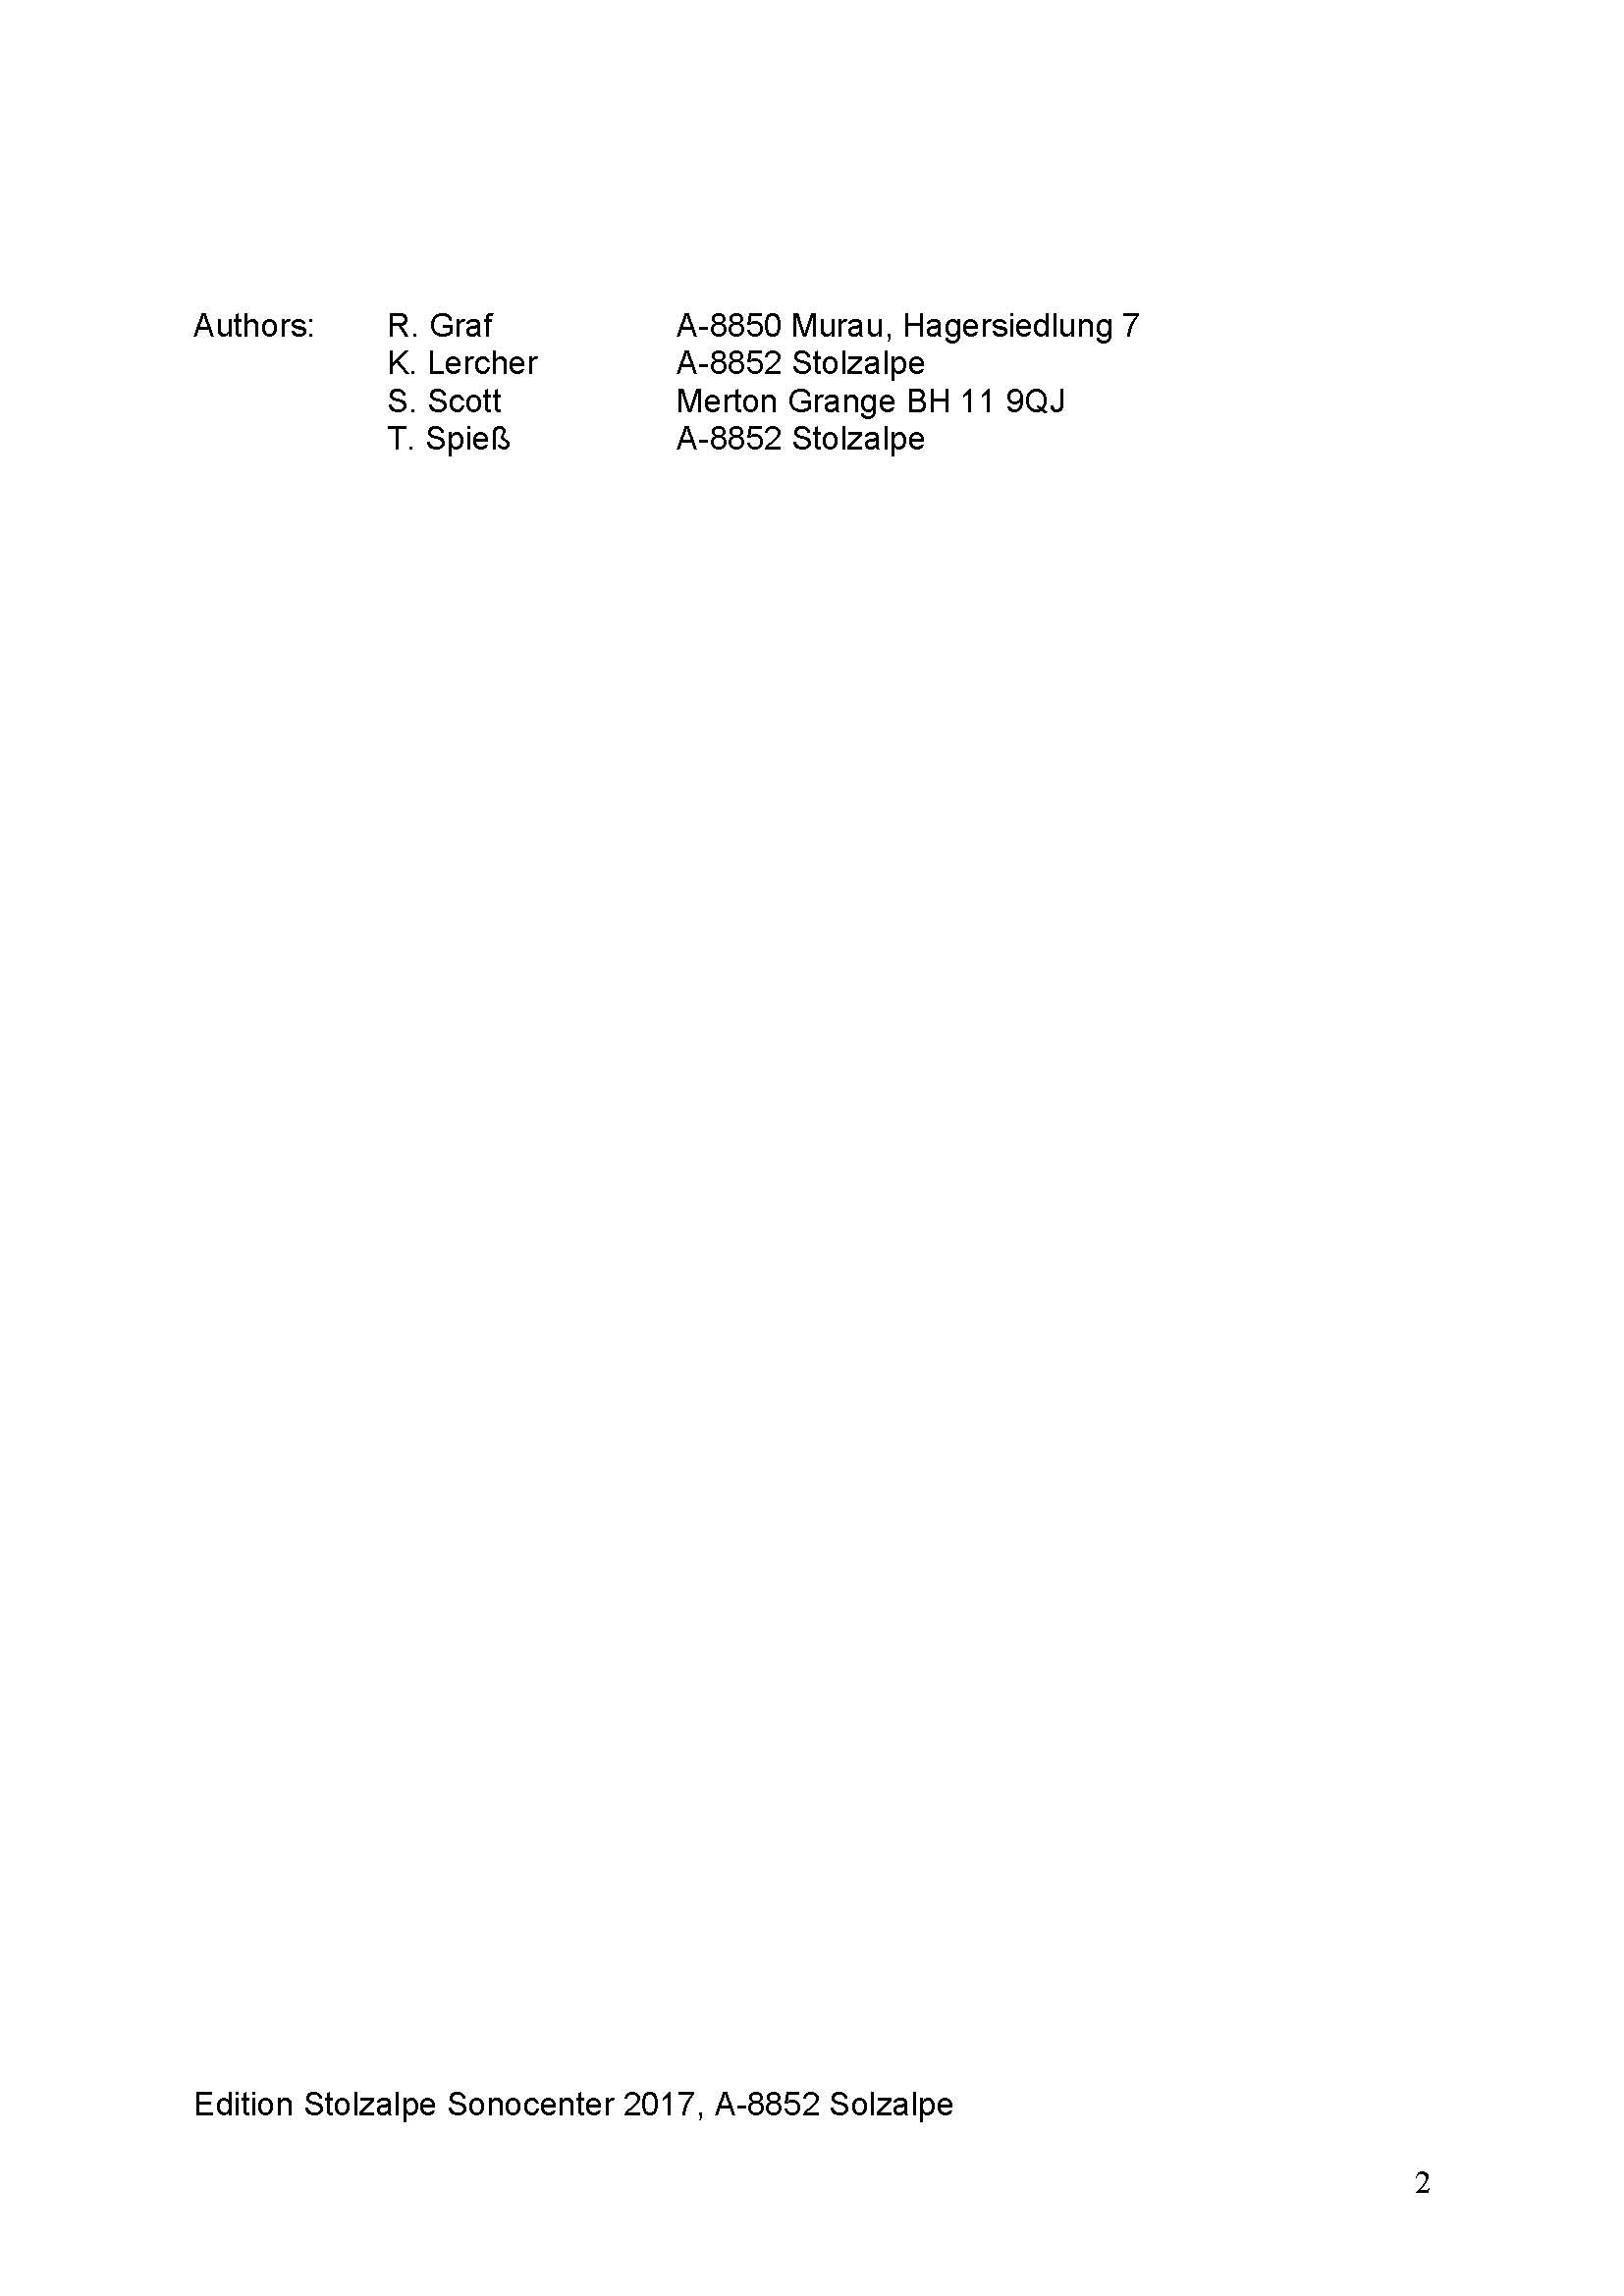 https://0501.nccdn.net/4_2/000/000/056/7dc/ManualHip-Sonography--Ma_rz-2017-1_Seite_02-1654x2339.jpg